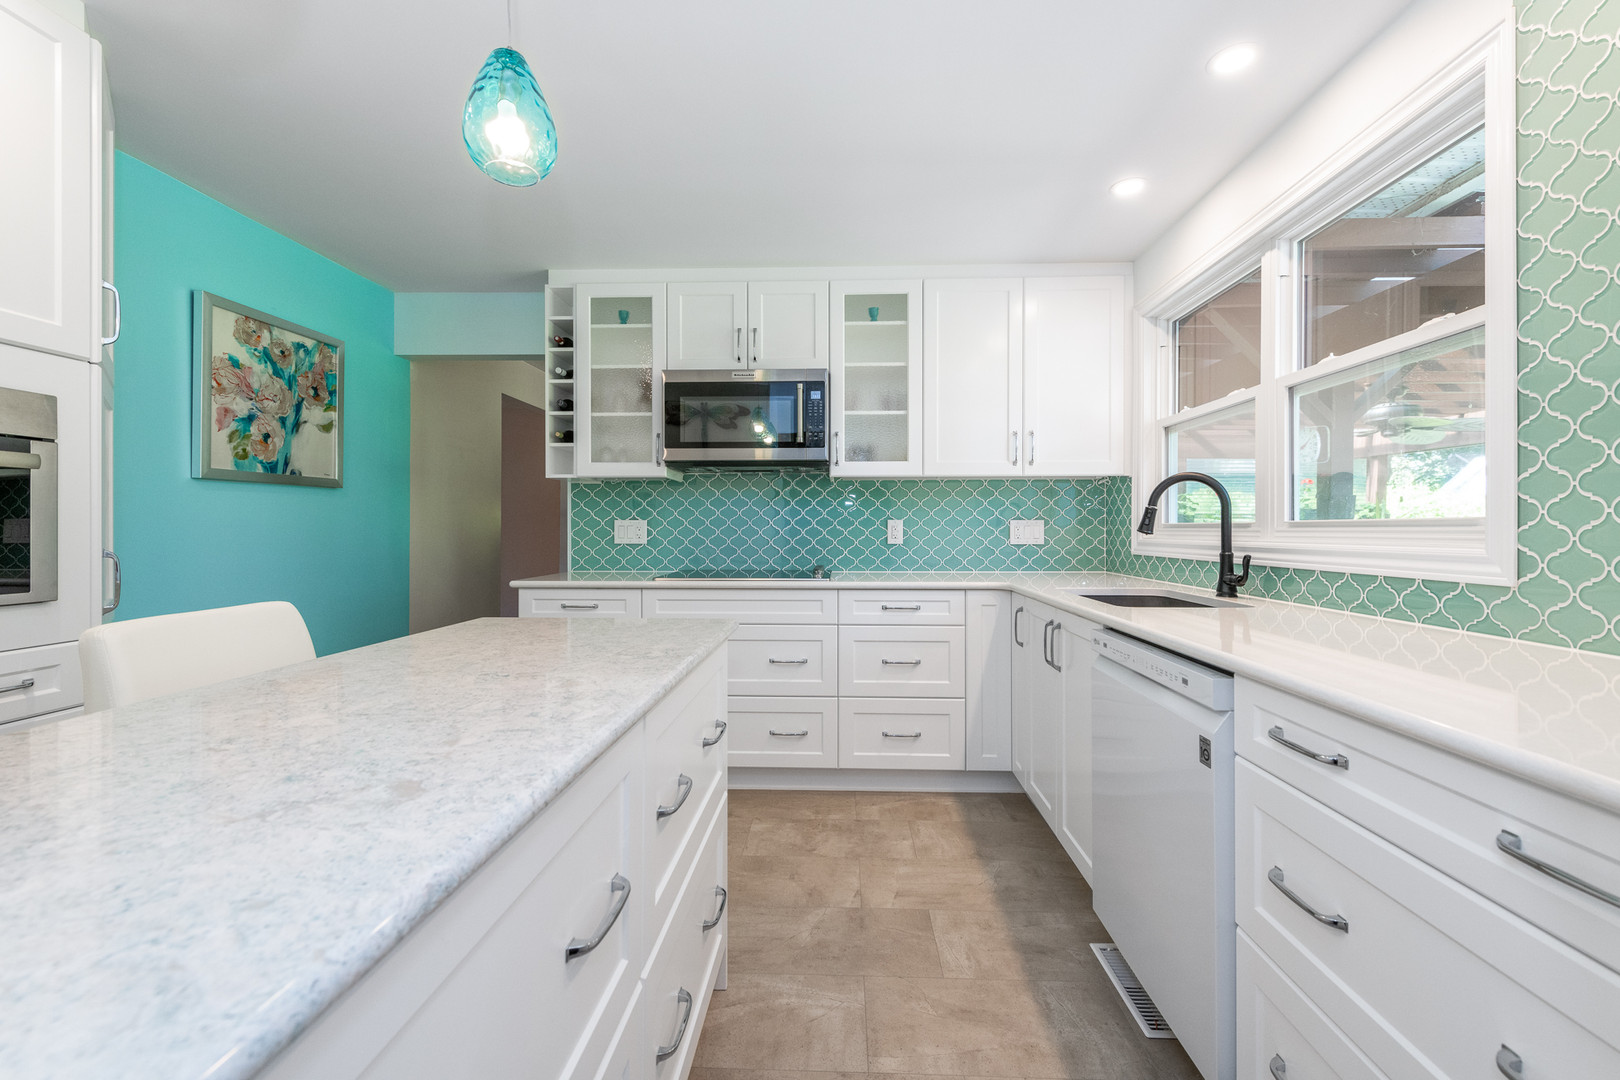 Kitchen dream scape tile